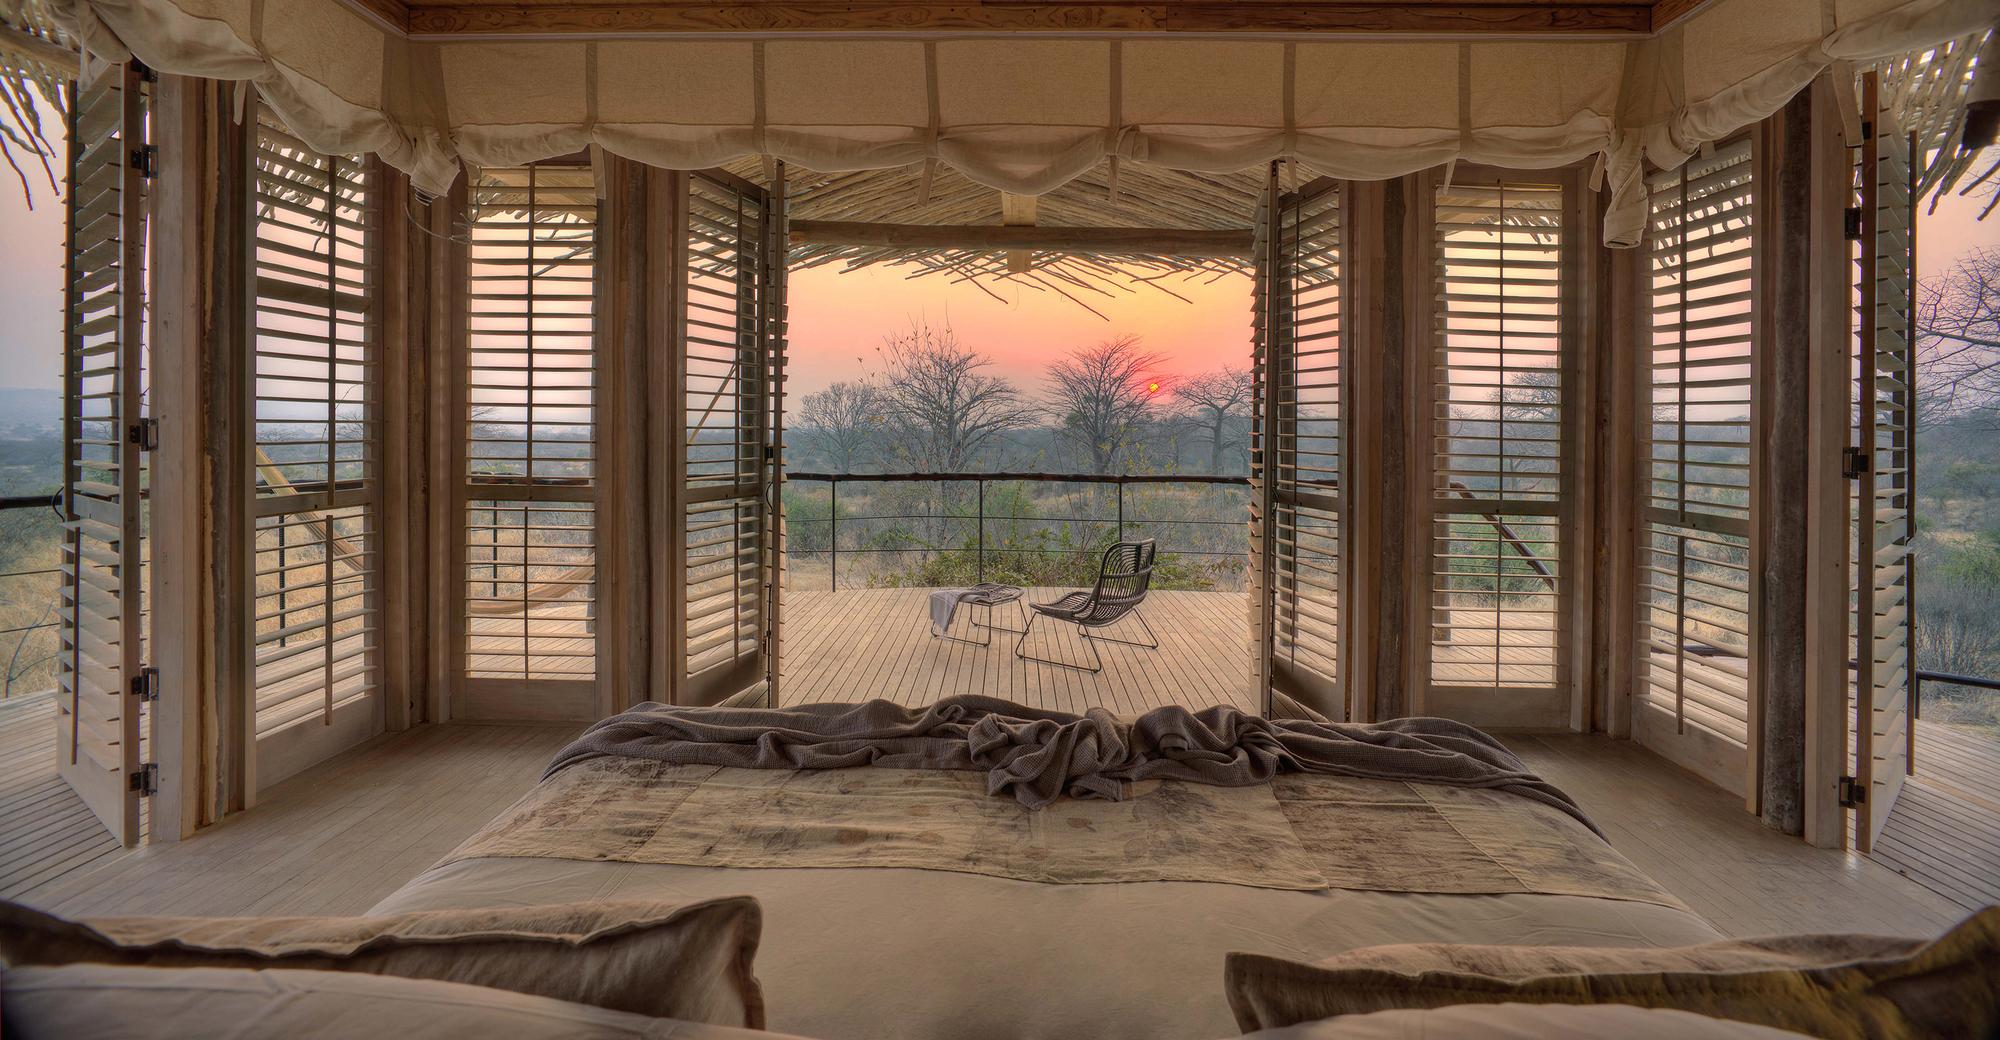 Sunset-at-the-African-Serengeti-viewed-from-the-Jabali-Ridge-Lodge-in-Tanzania